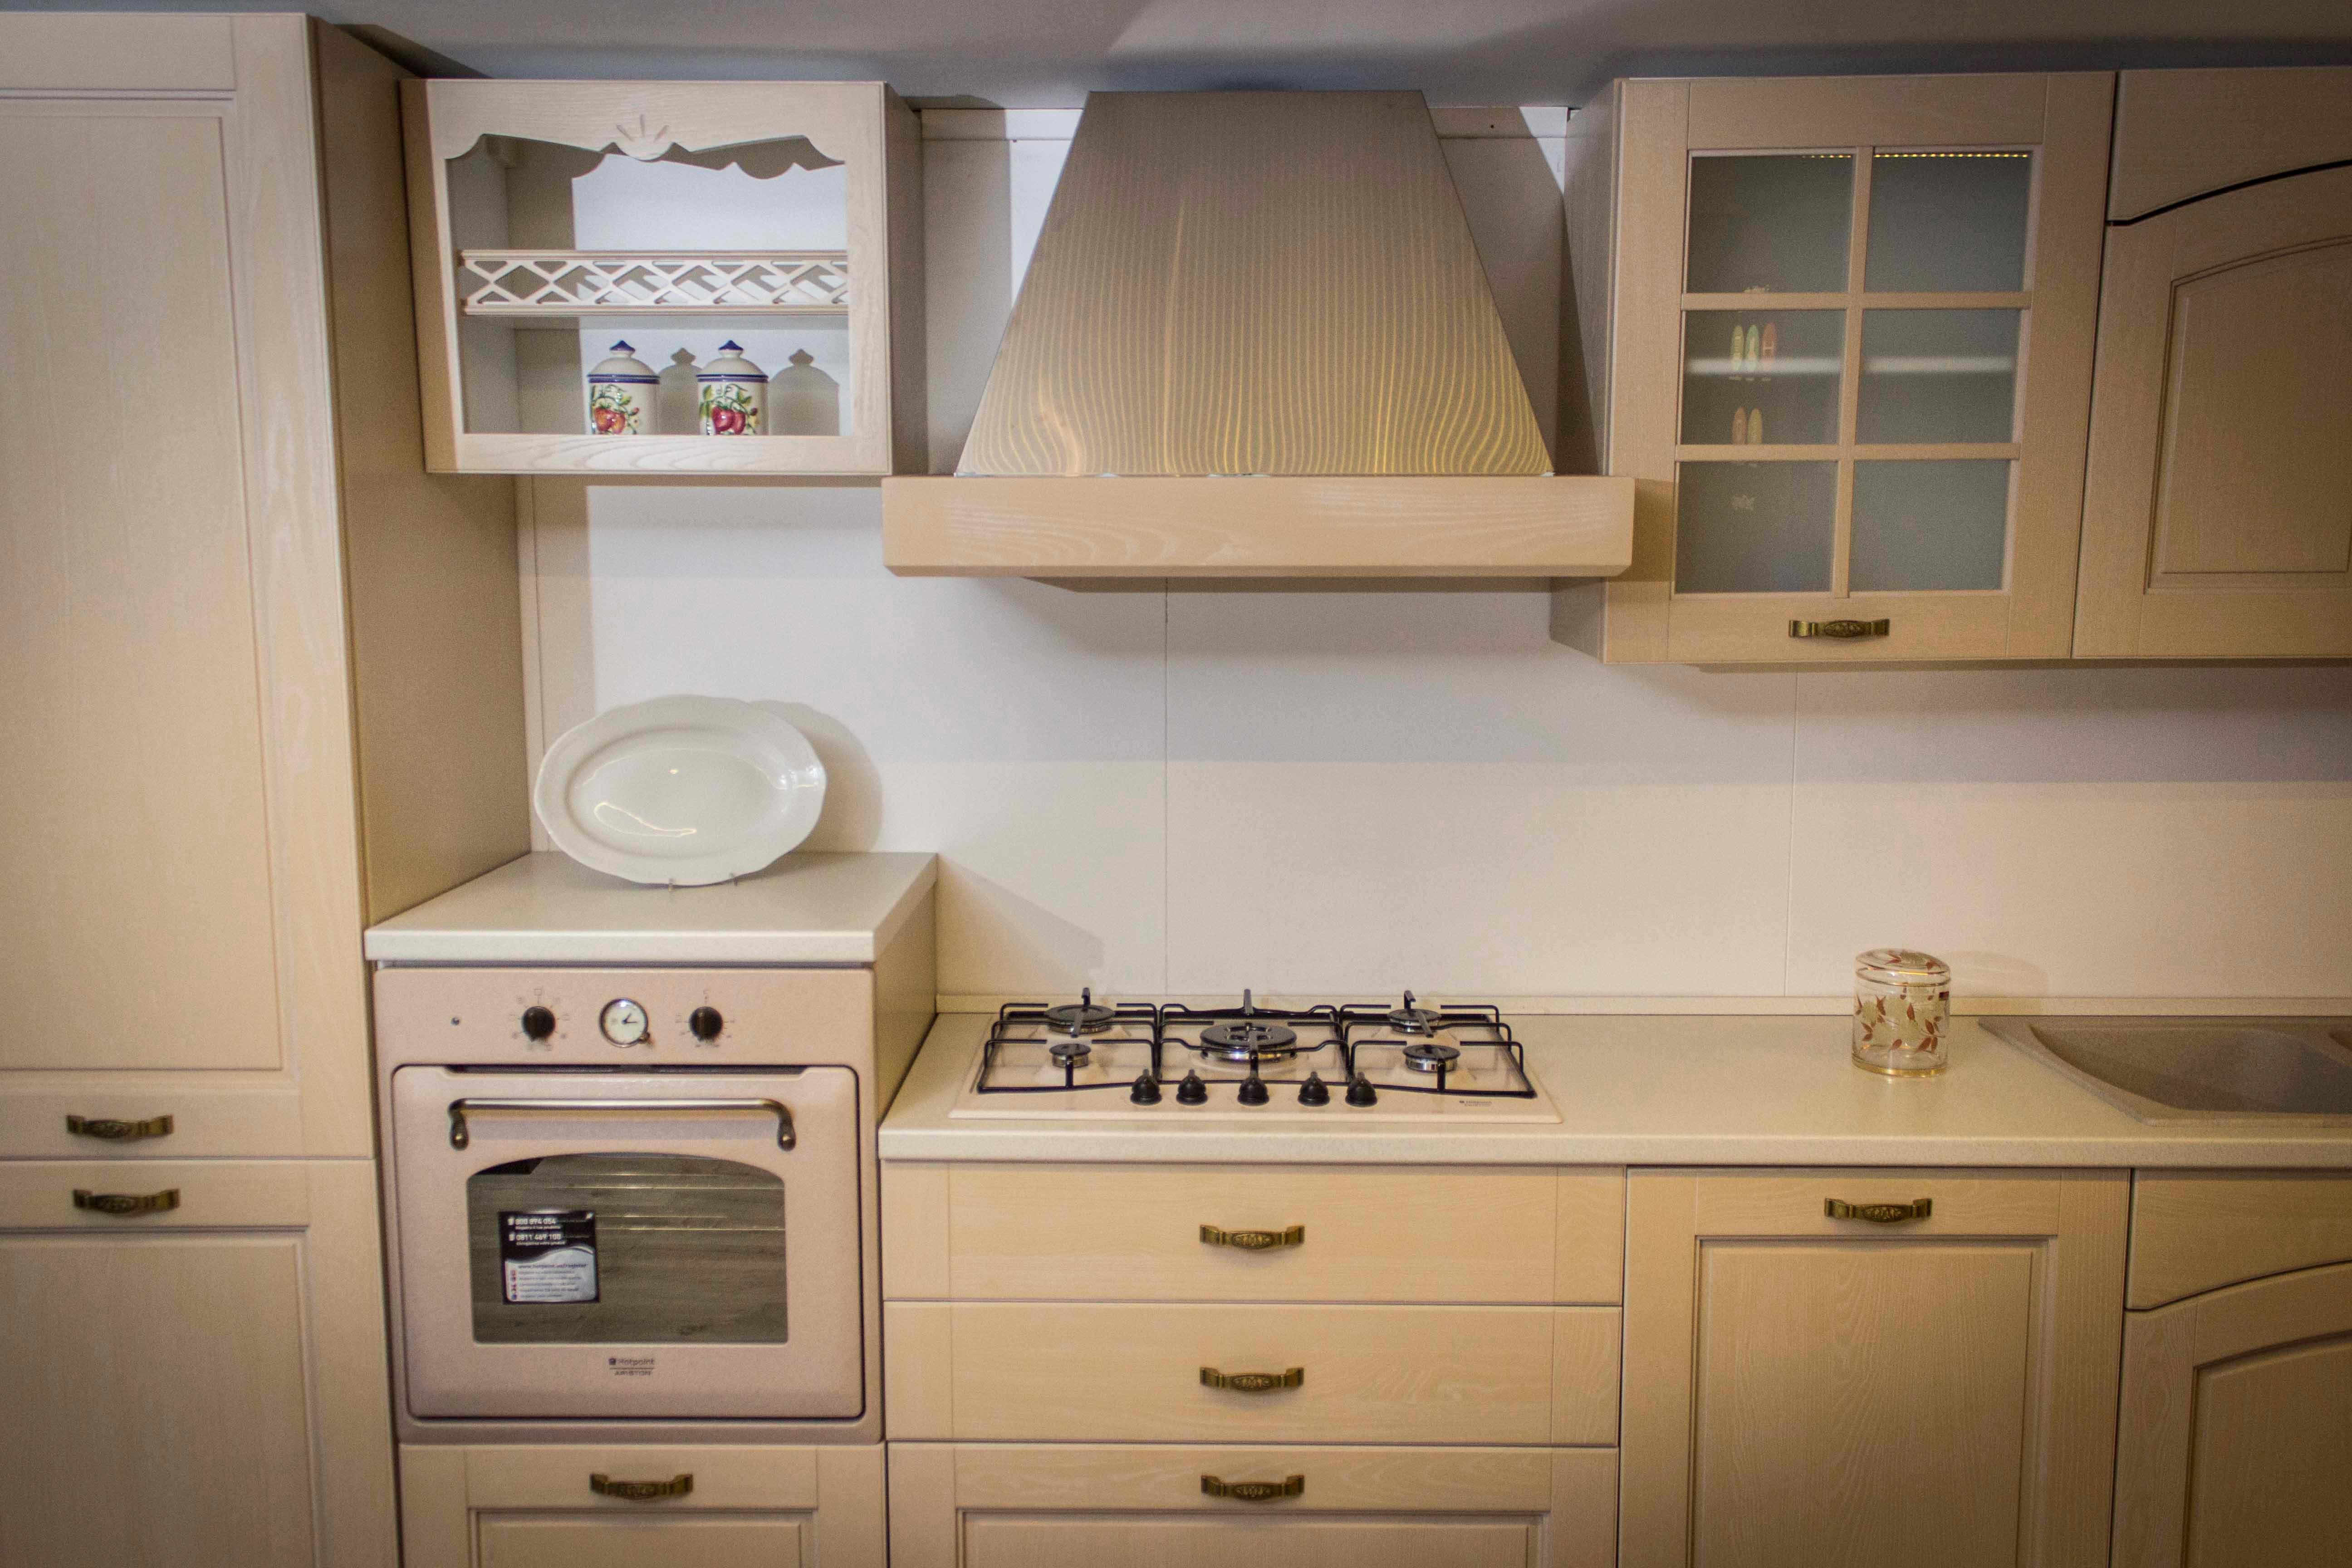 Cucina mobilturi aisha scontata del 58 cucine a prezzi for Top per cucine prezzi